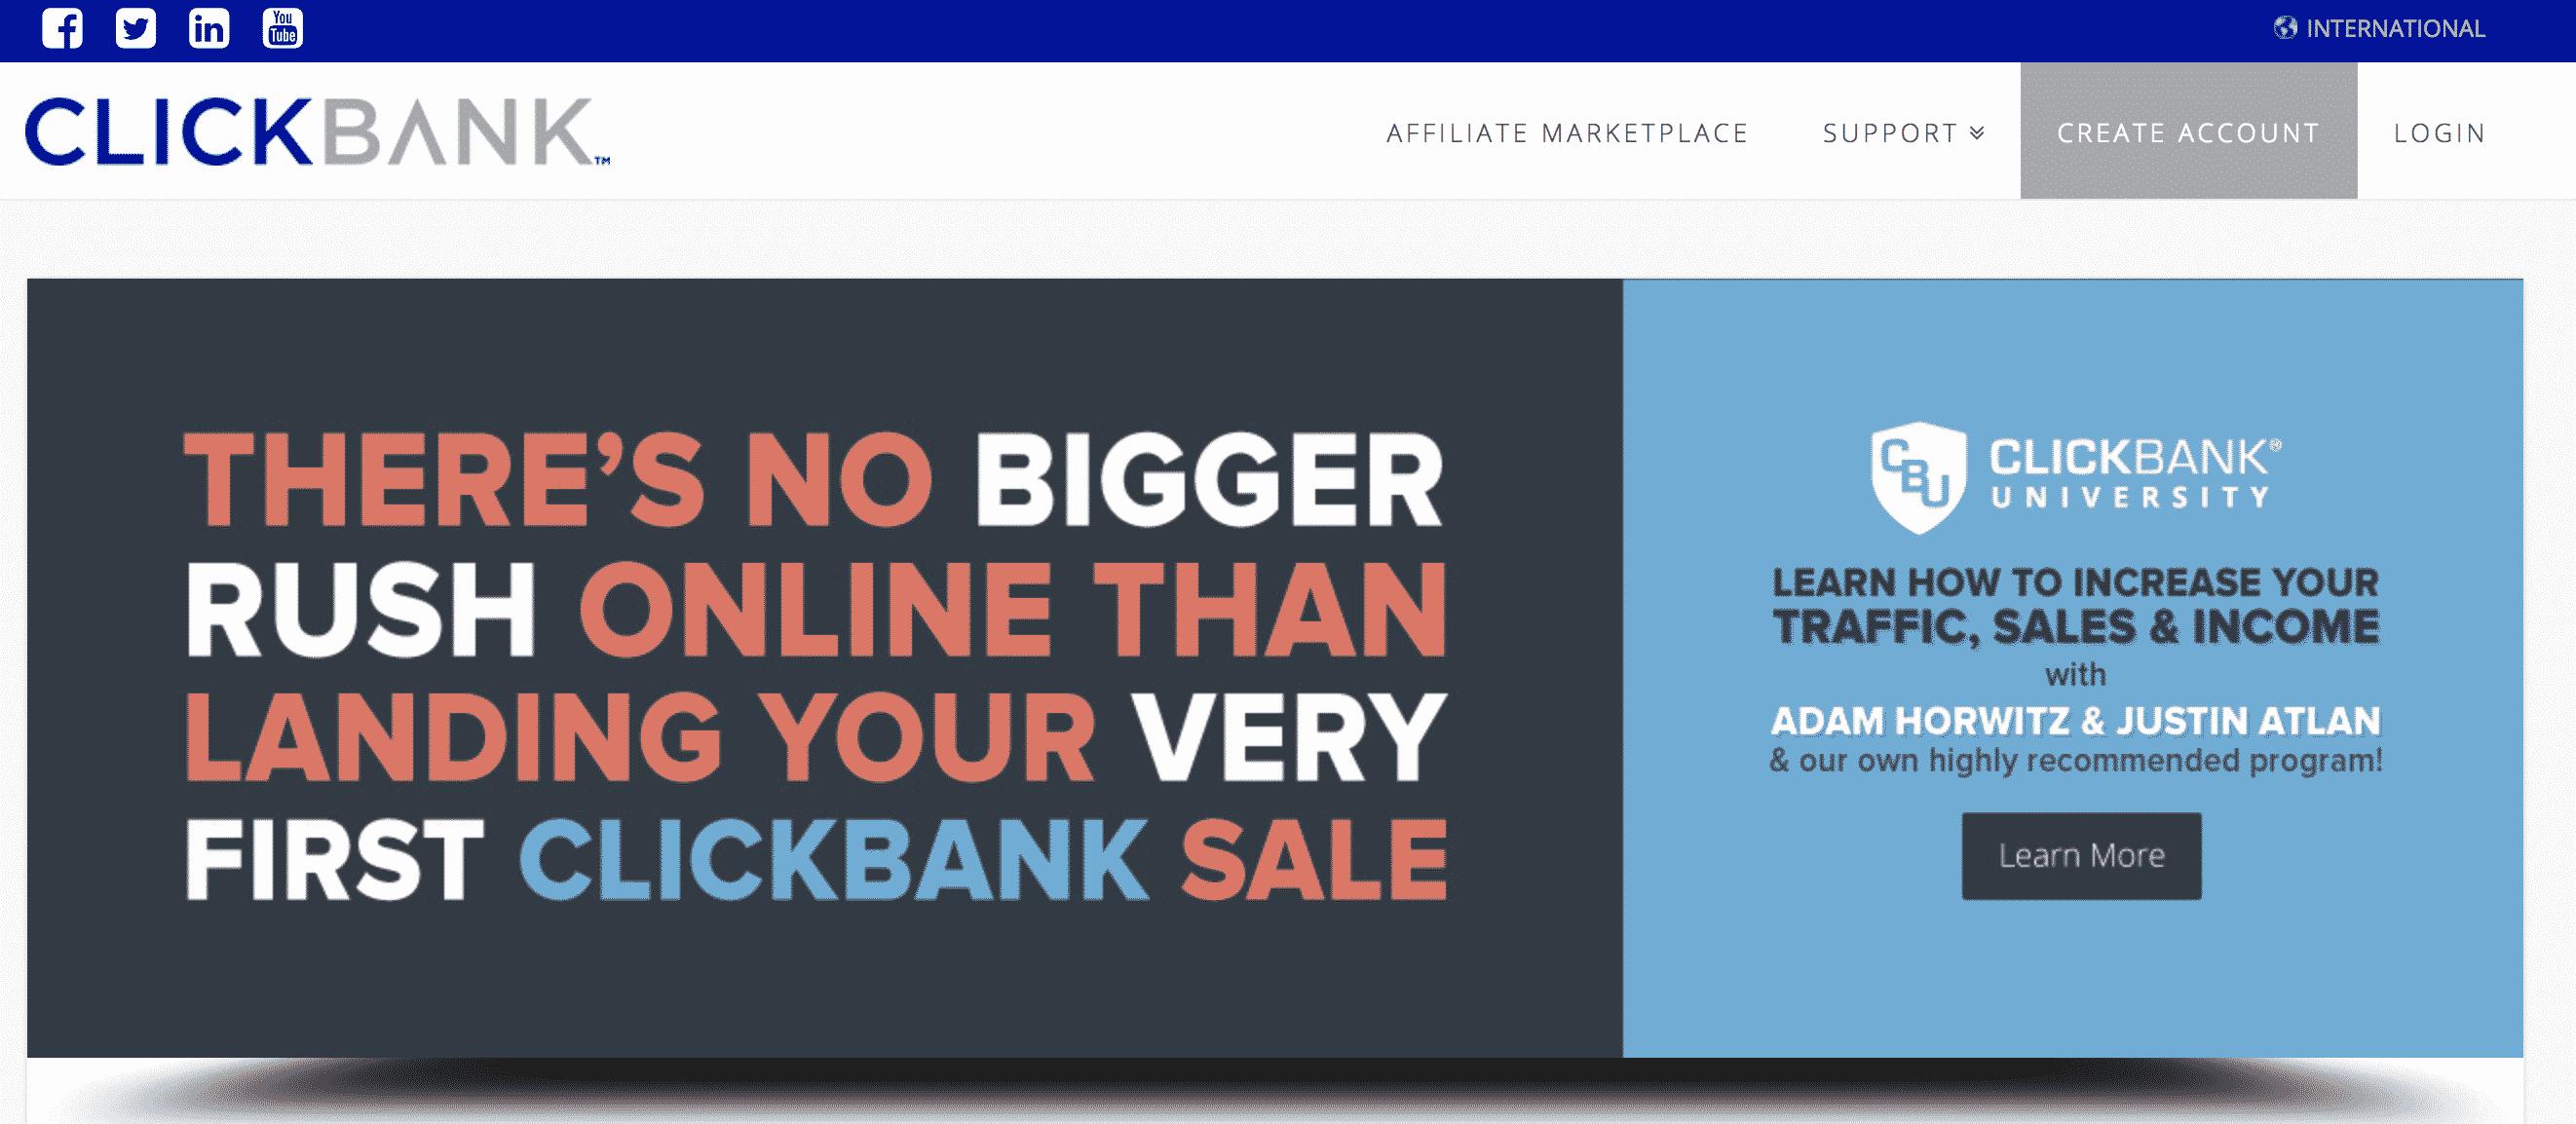 Clickbank Affiliate Marketing Website